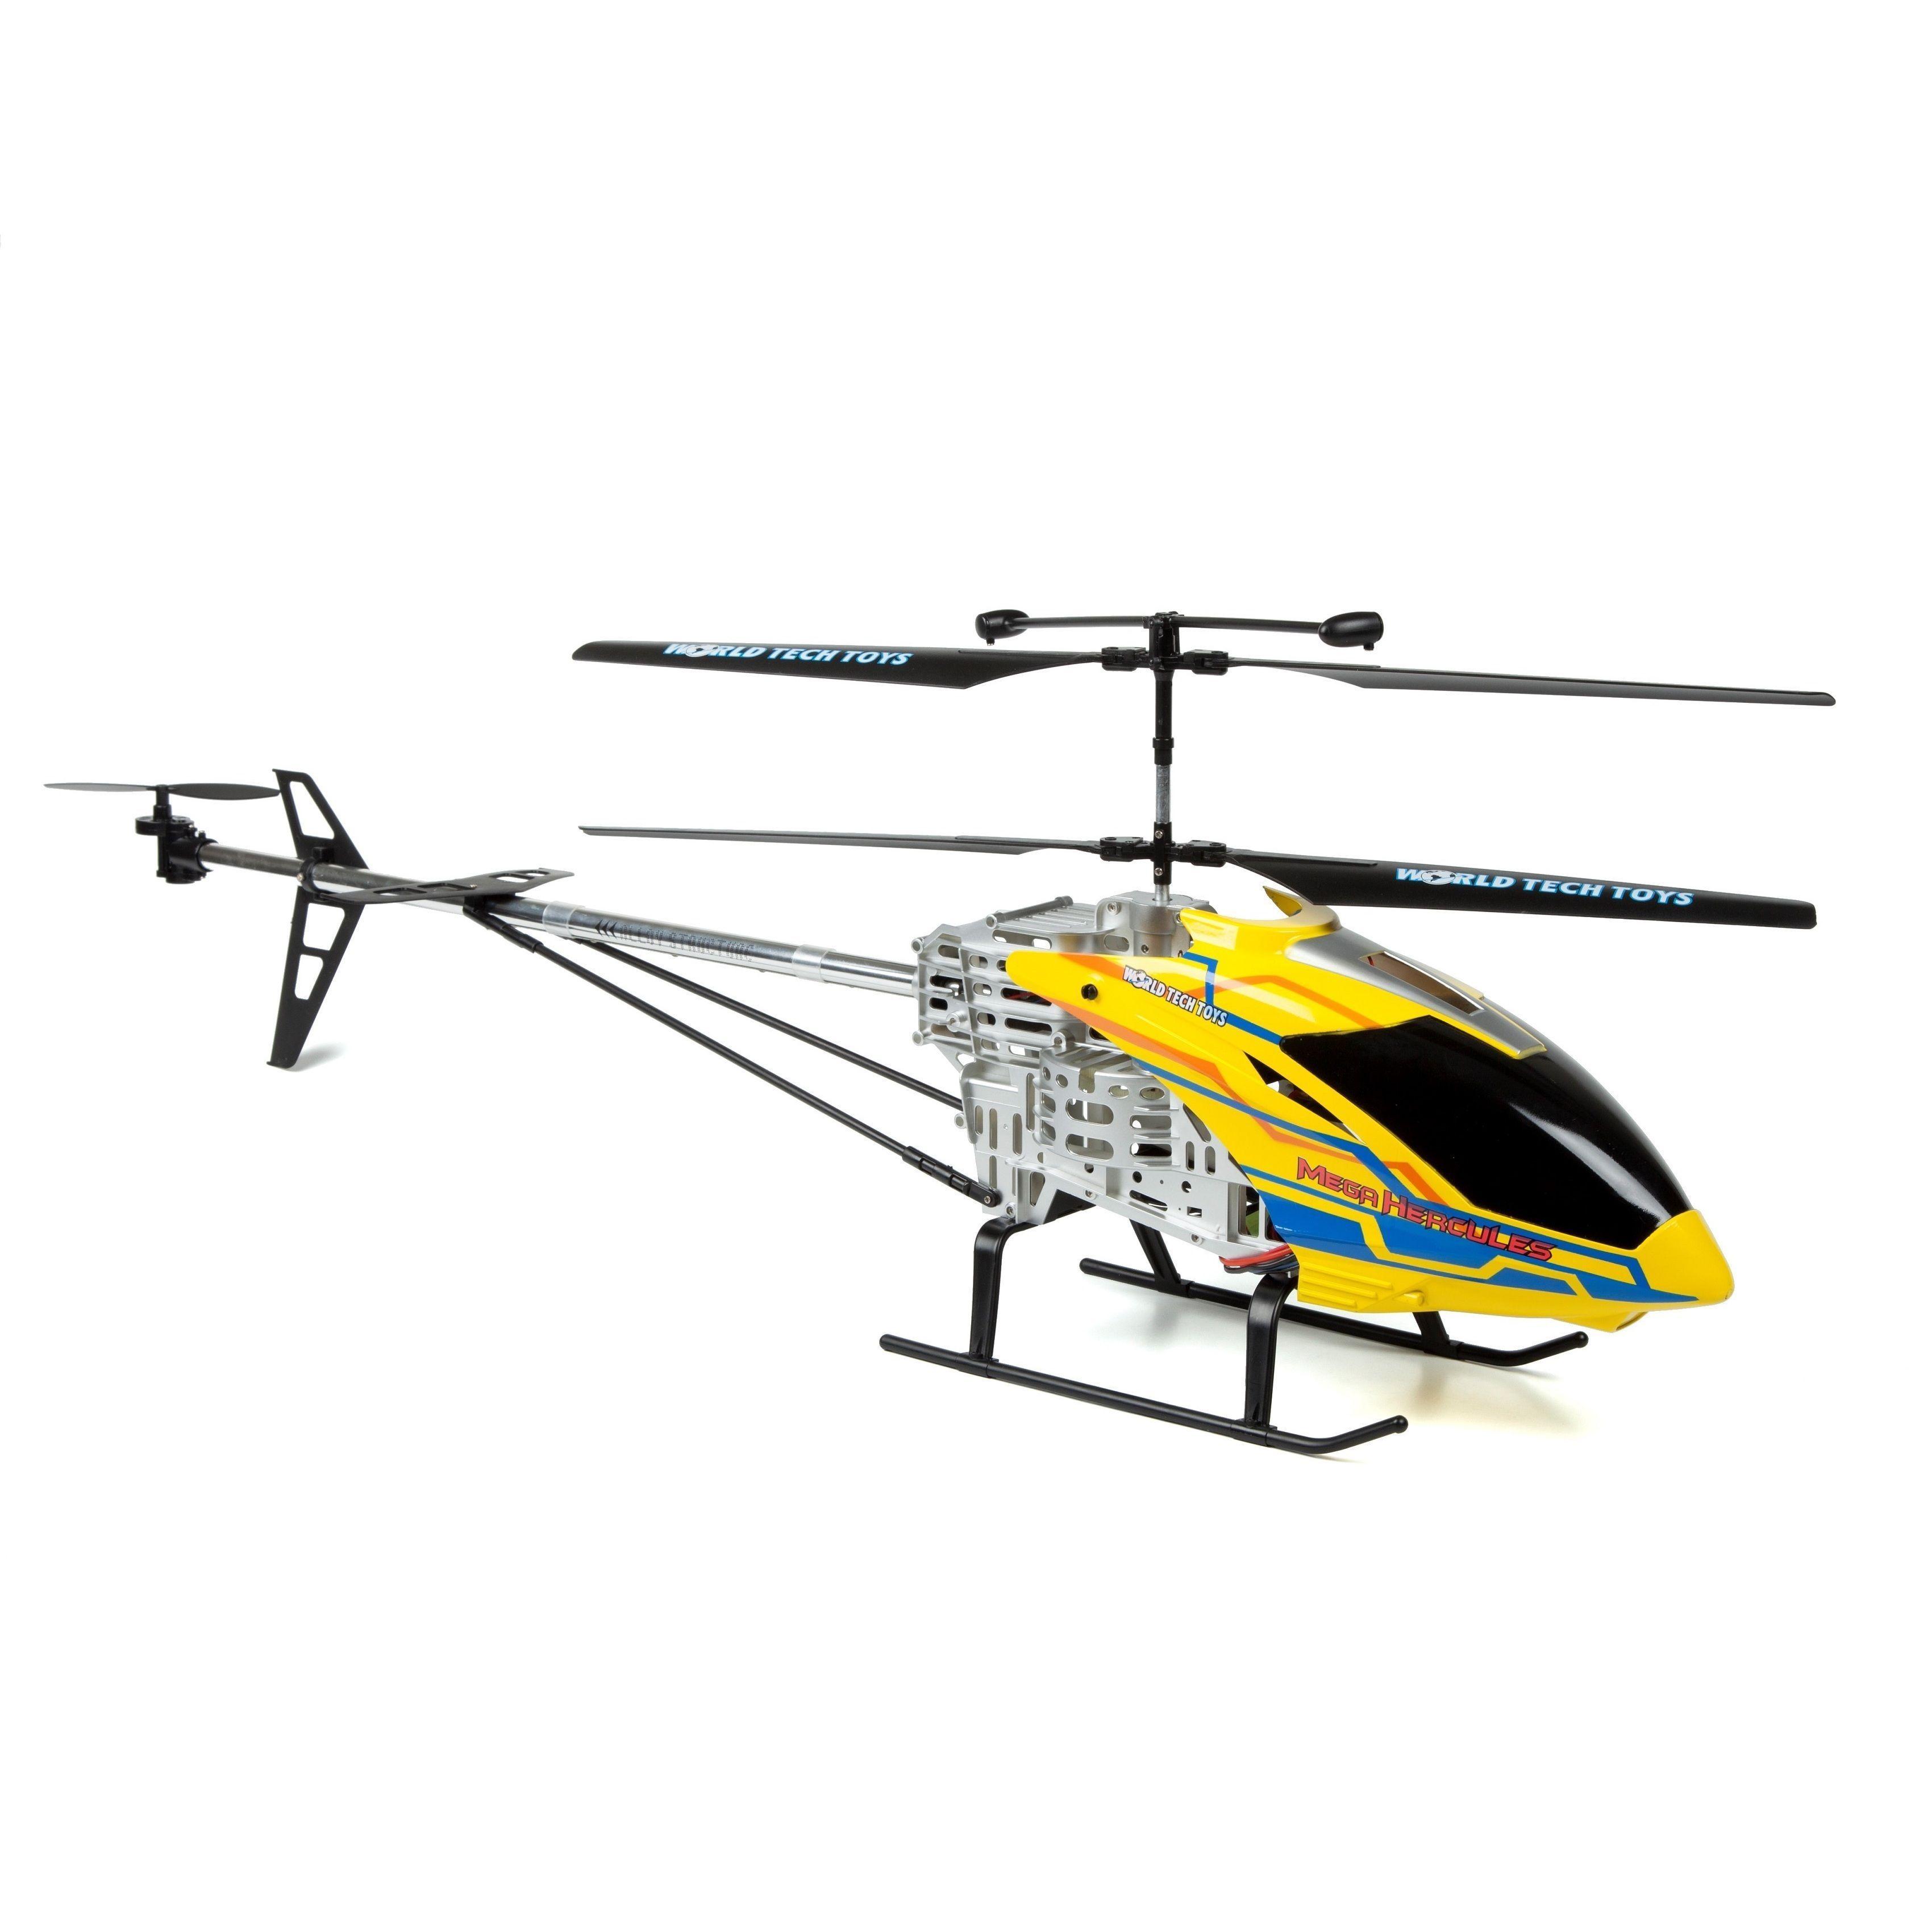 World Tech Mega Hercules Super Tuff Rc Helicopter Yellow